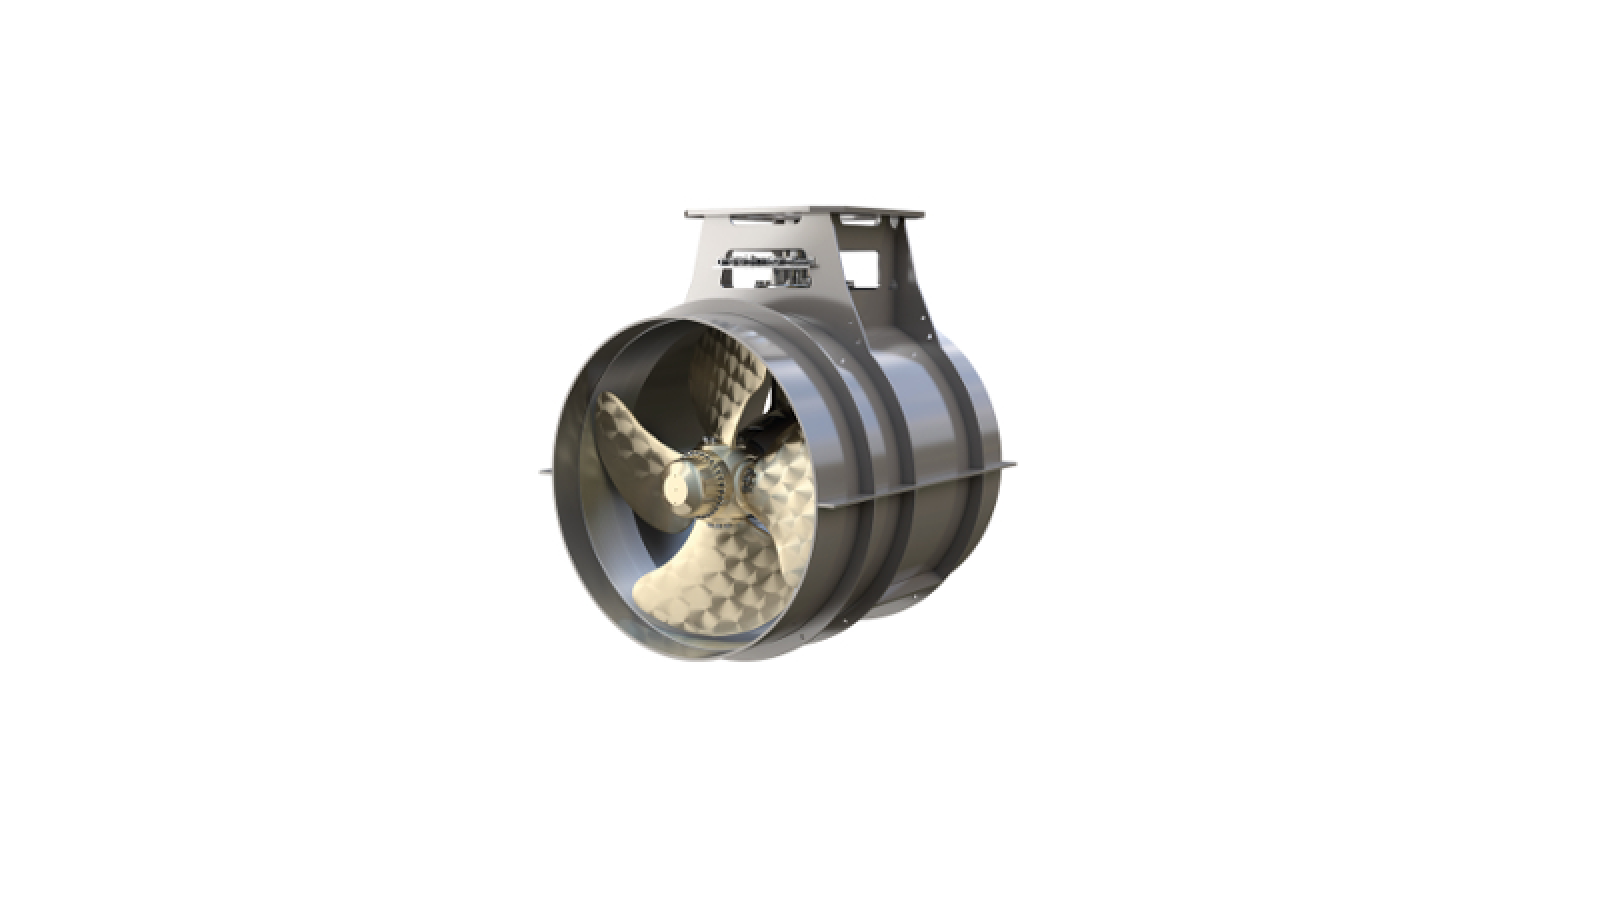 Transverse thrusters (Marine Thruster Transverse, MTT)